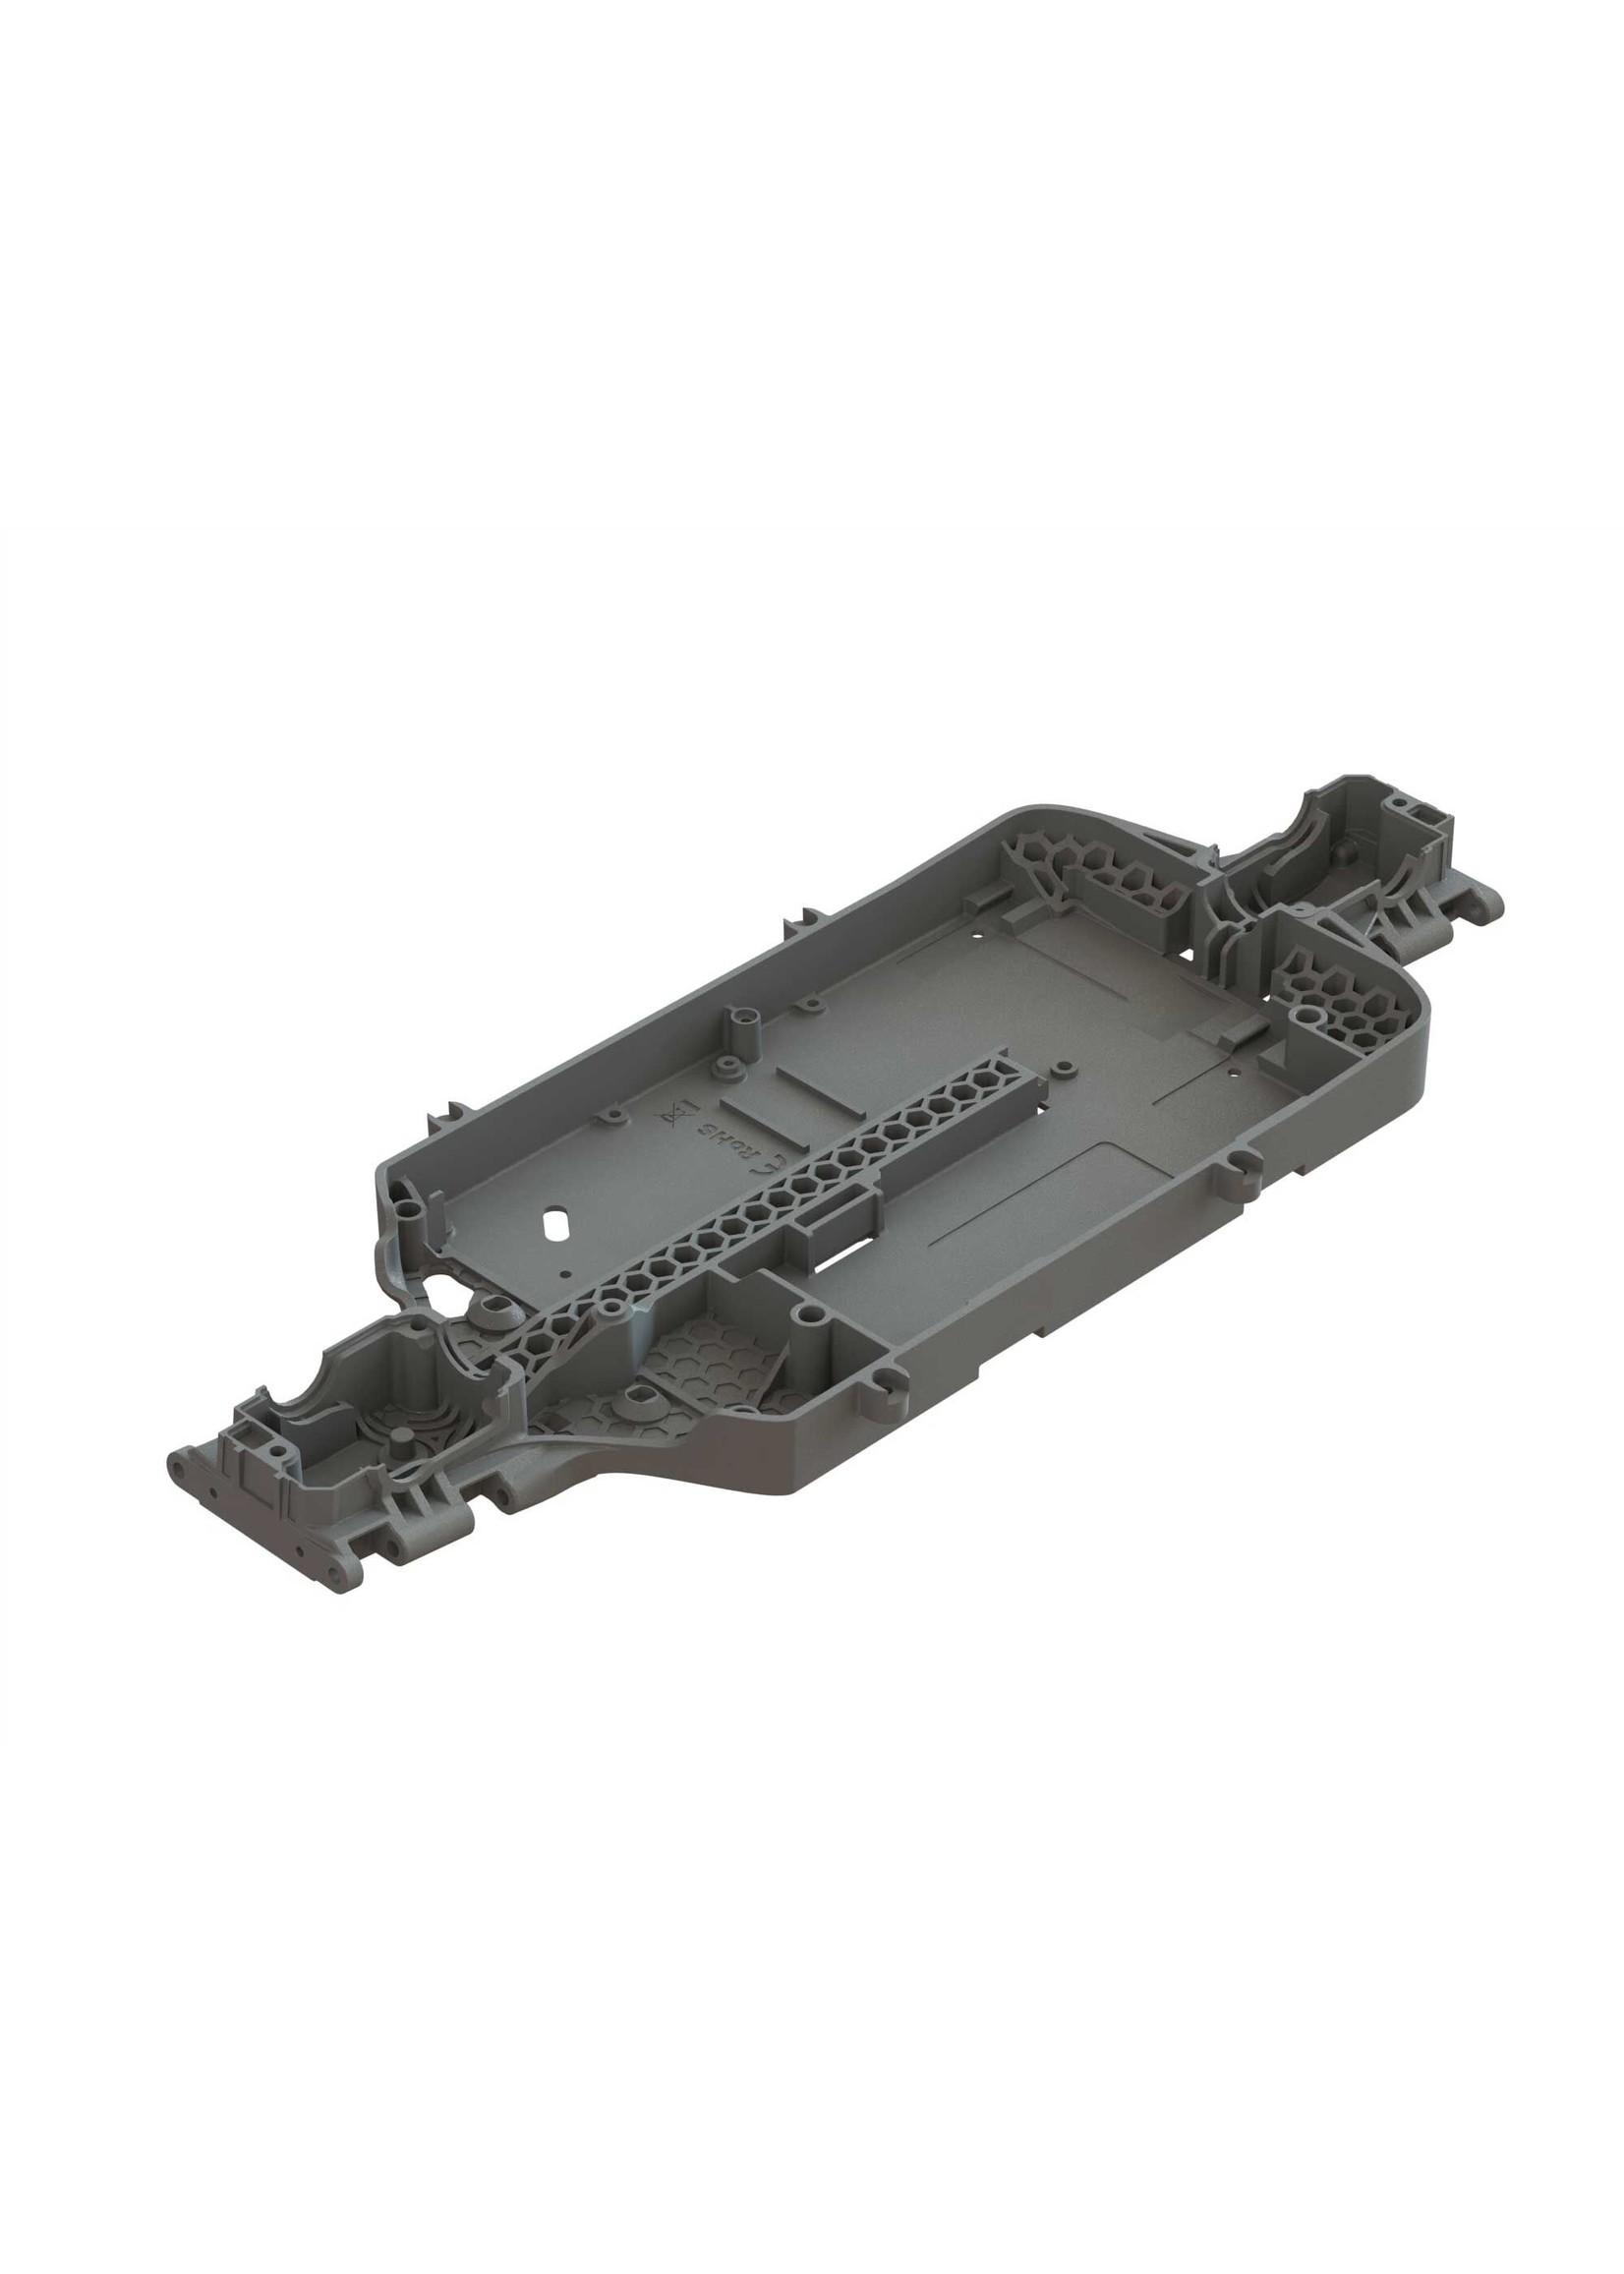 ARRMA ARA320608 Arrma Composite Chassis - LWB